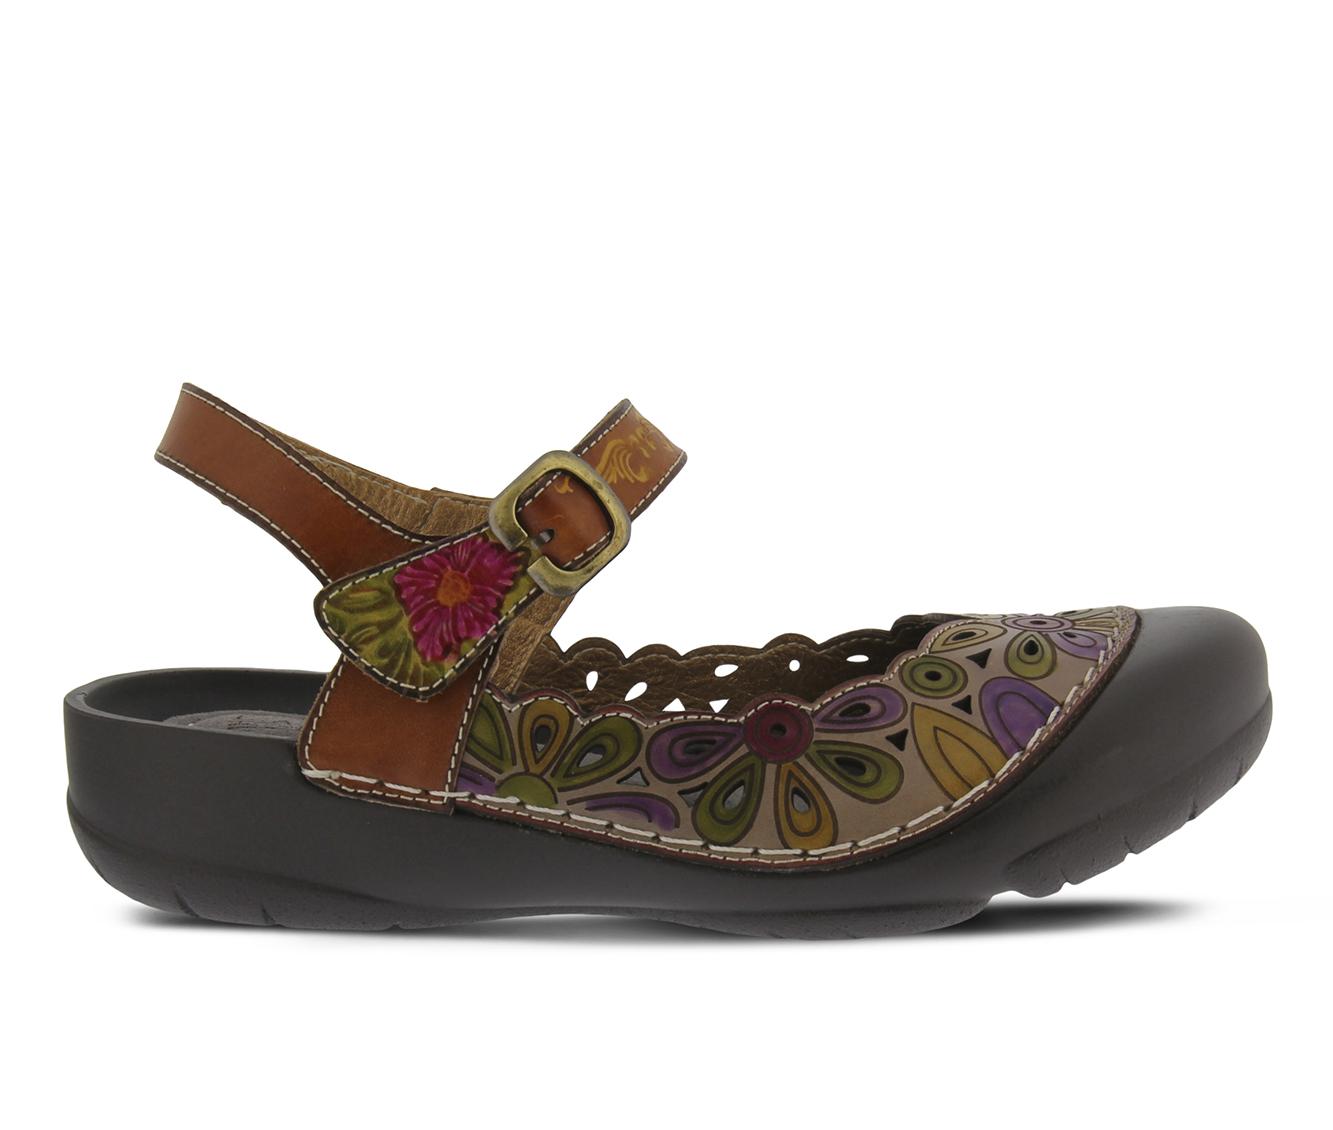 L'Artiste Tonisha Women's Shoe (Brown Leather)